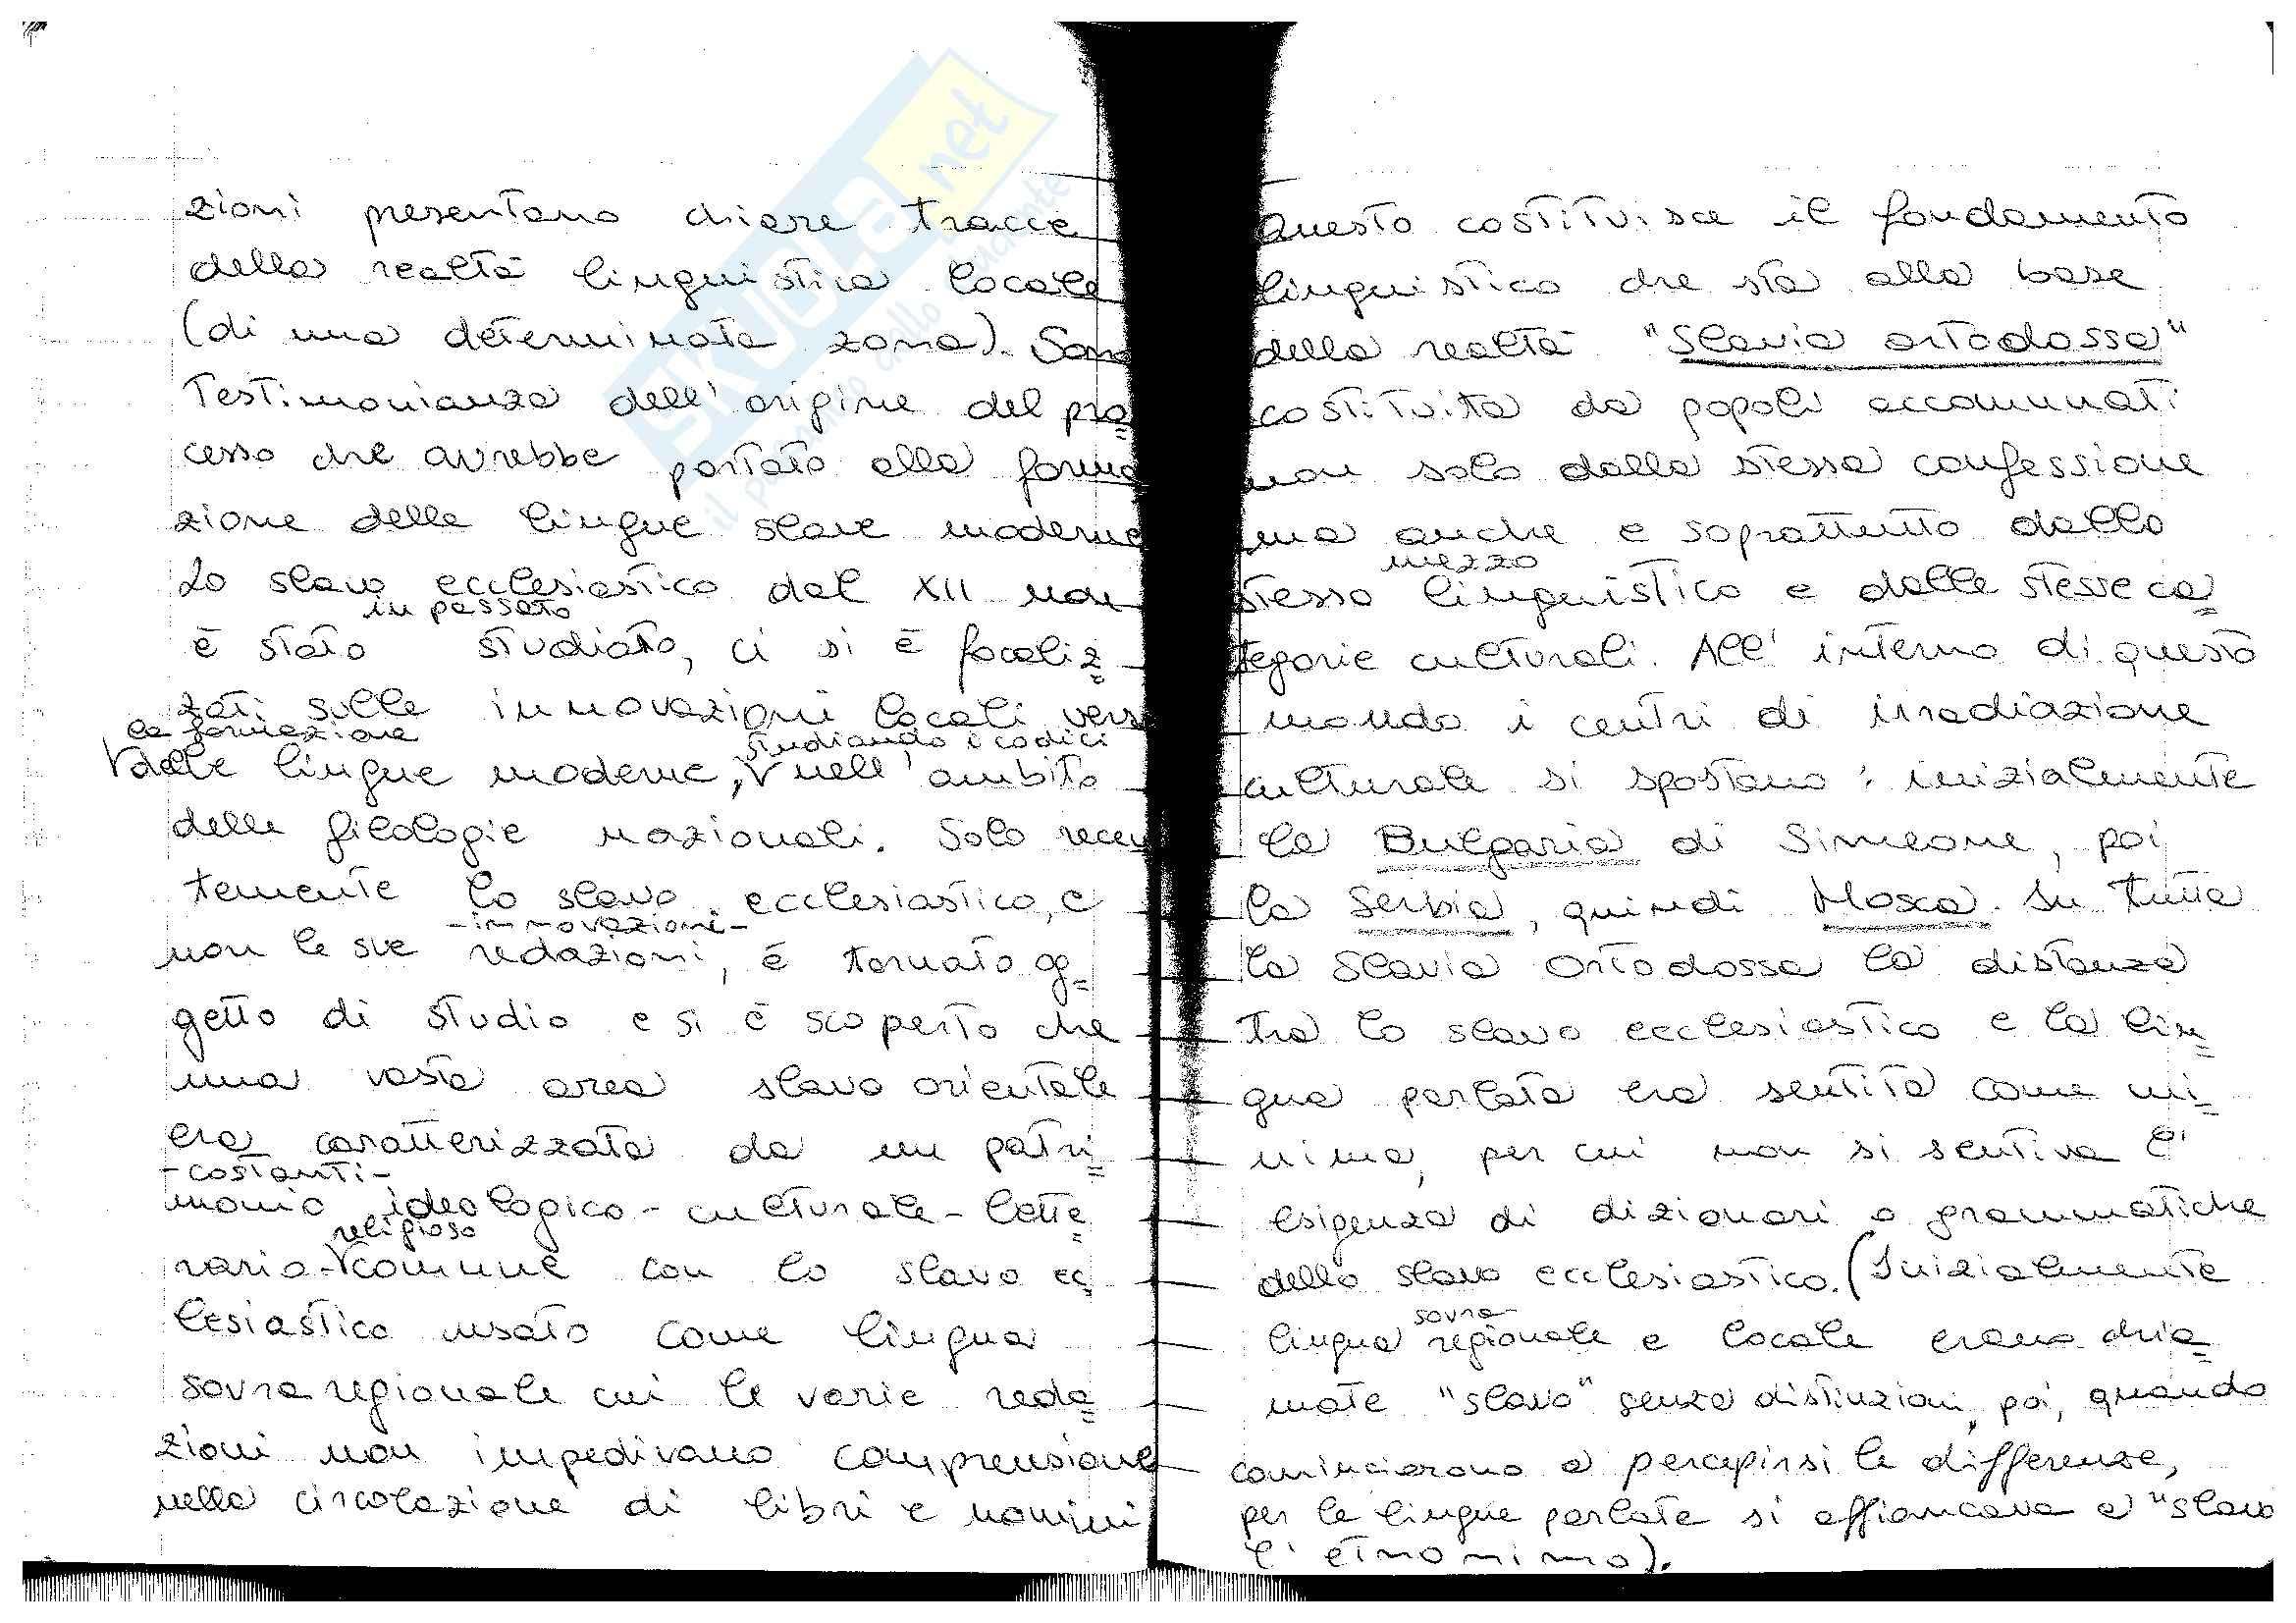 appunto N. Marcialis Filologia slava